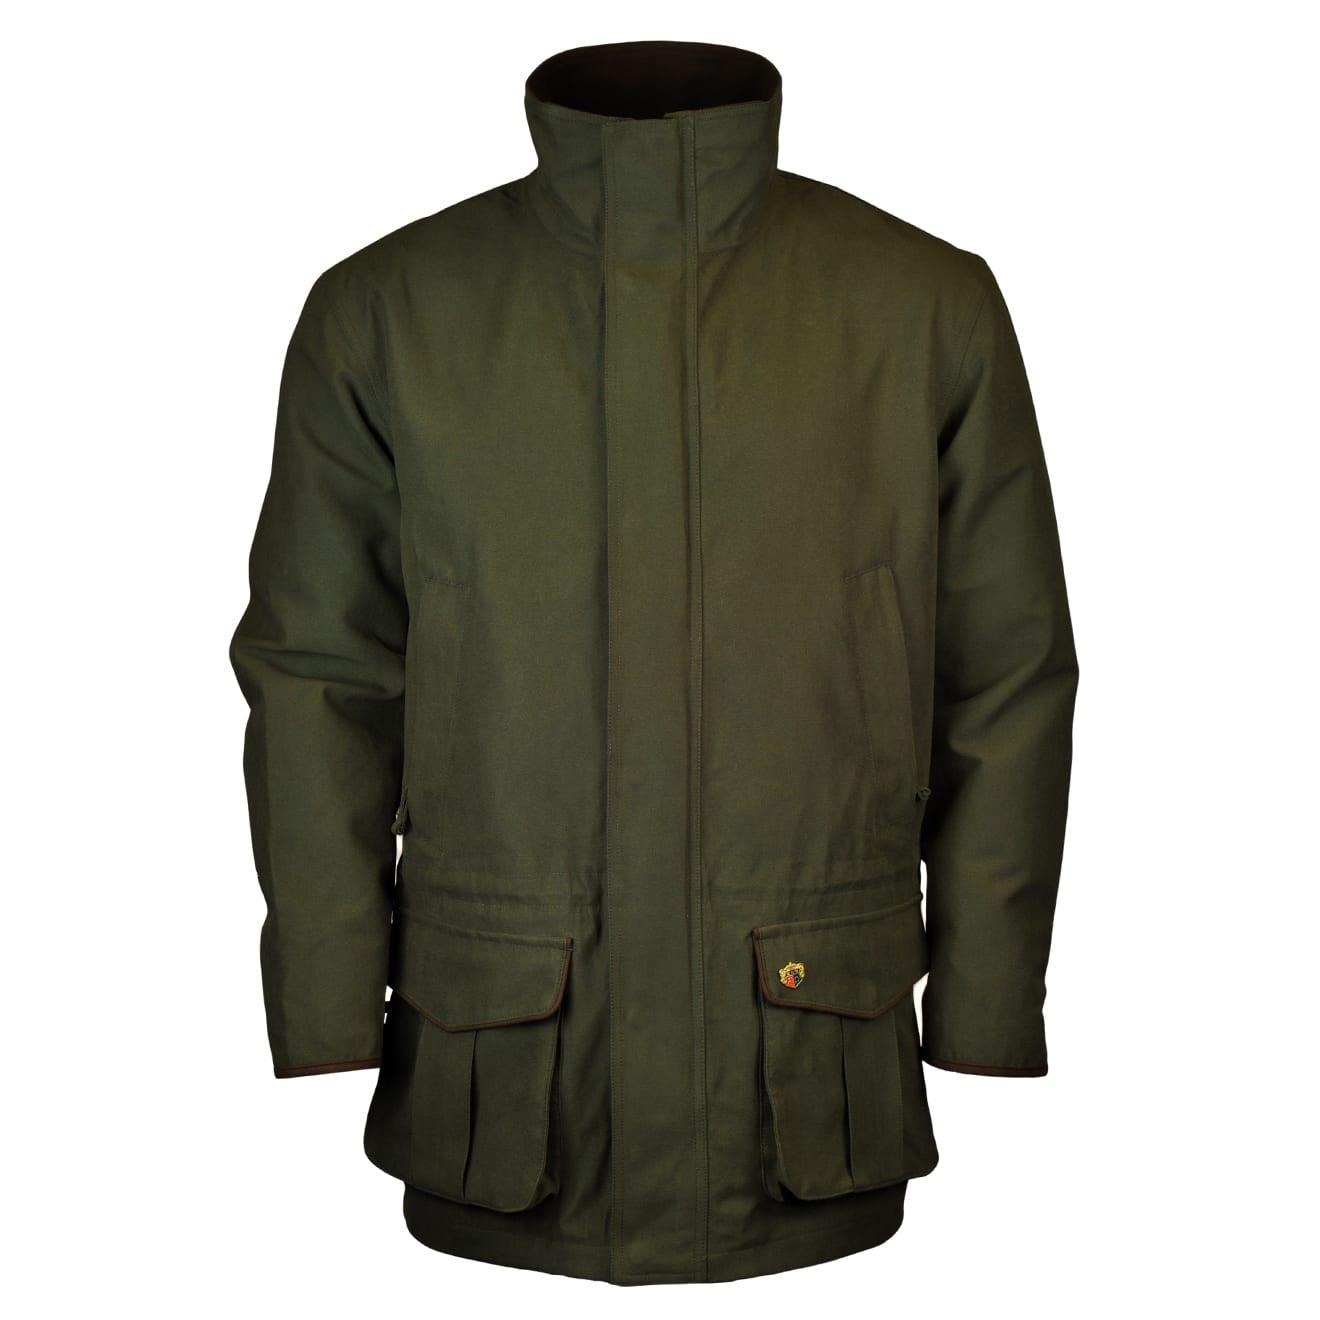 Alan Paine bergcot berwick waterproof shooting jacket olive 2